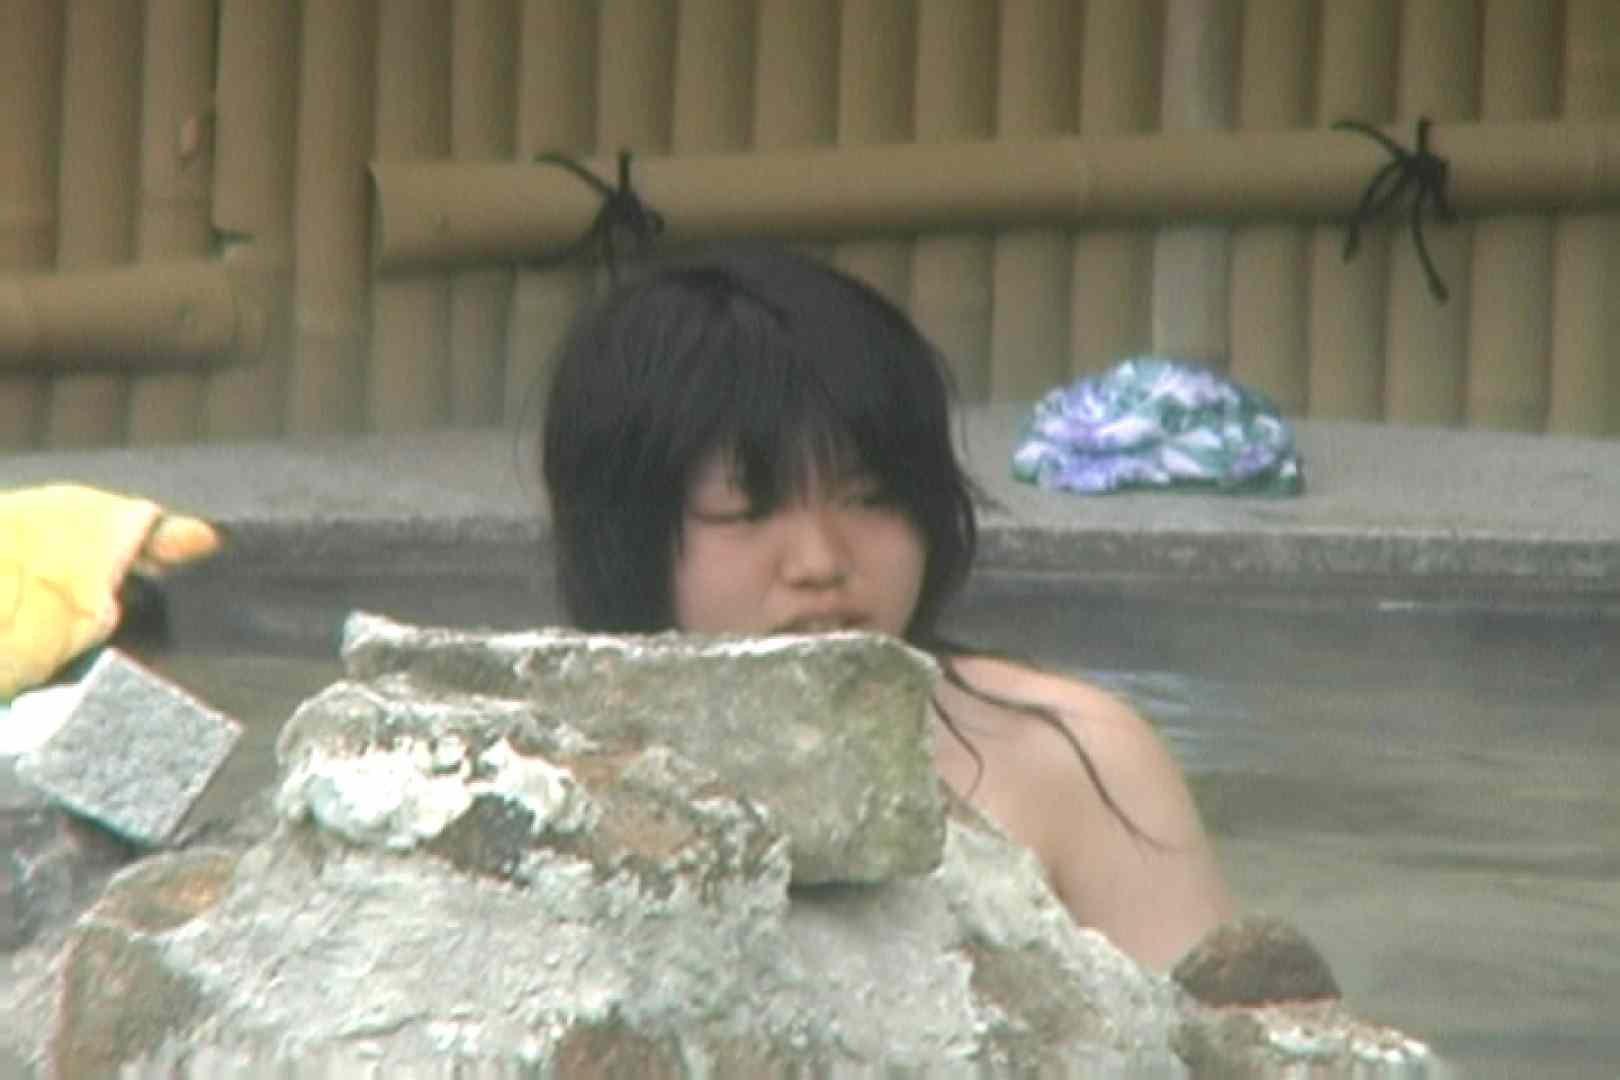 Aquaな露天風呂Vol.566 盗撮 オマンコ無修正動画無料 75枚 26